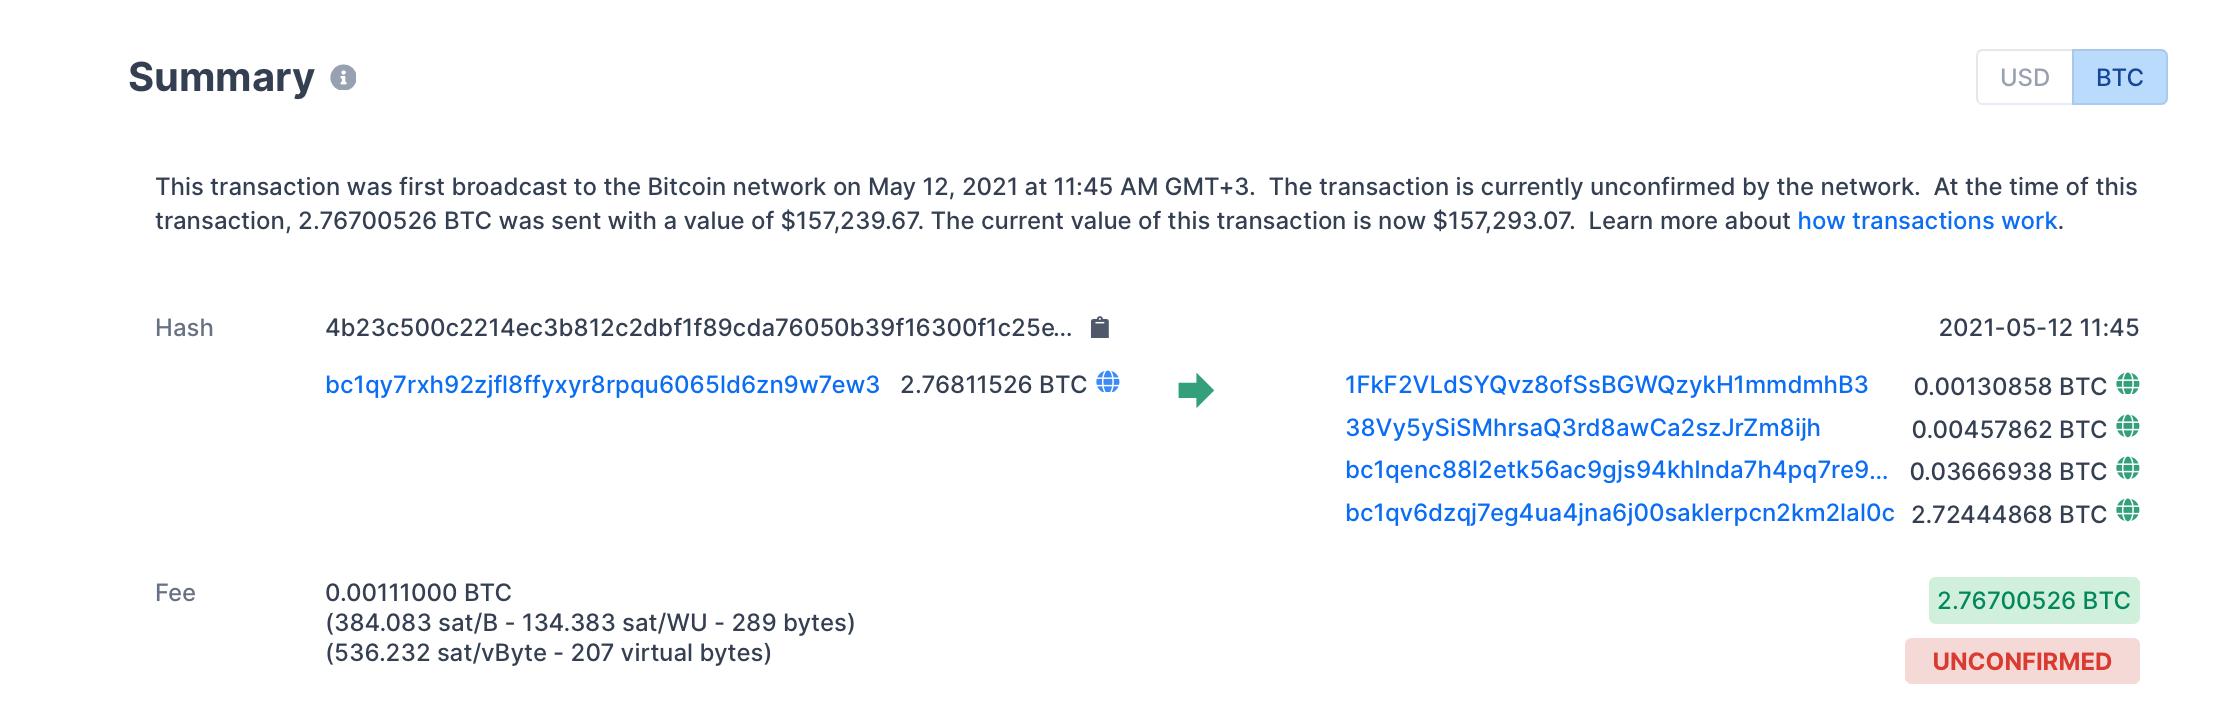 биткоин транзакция перевод